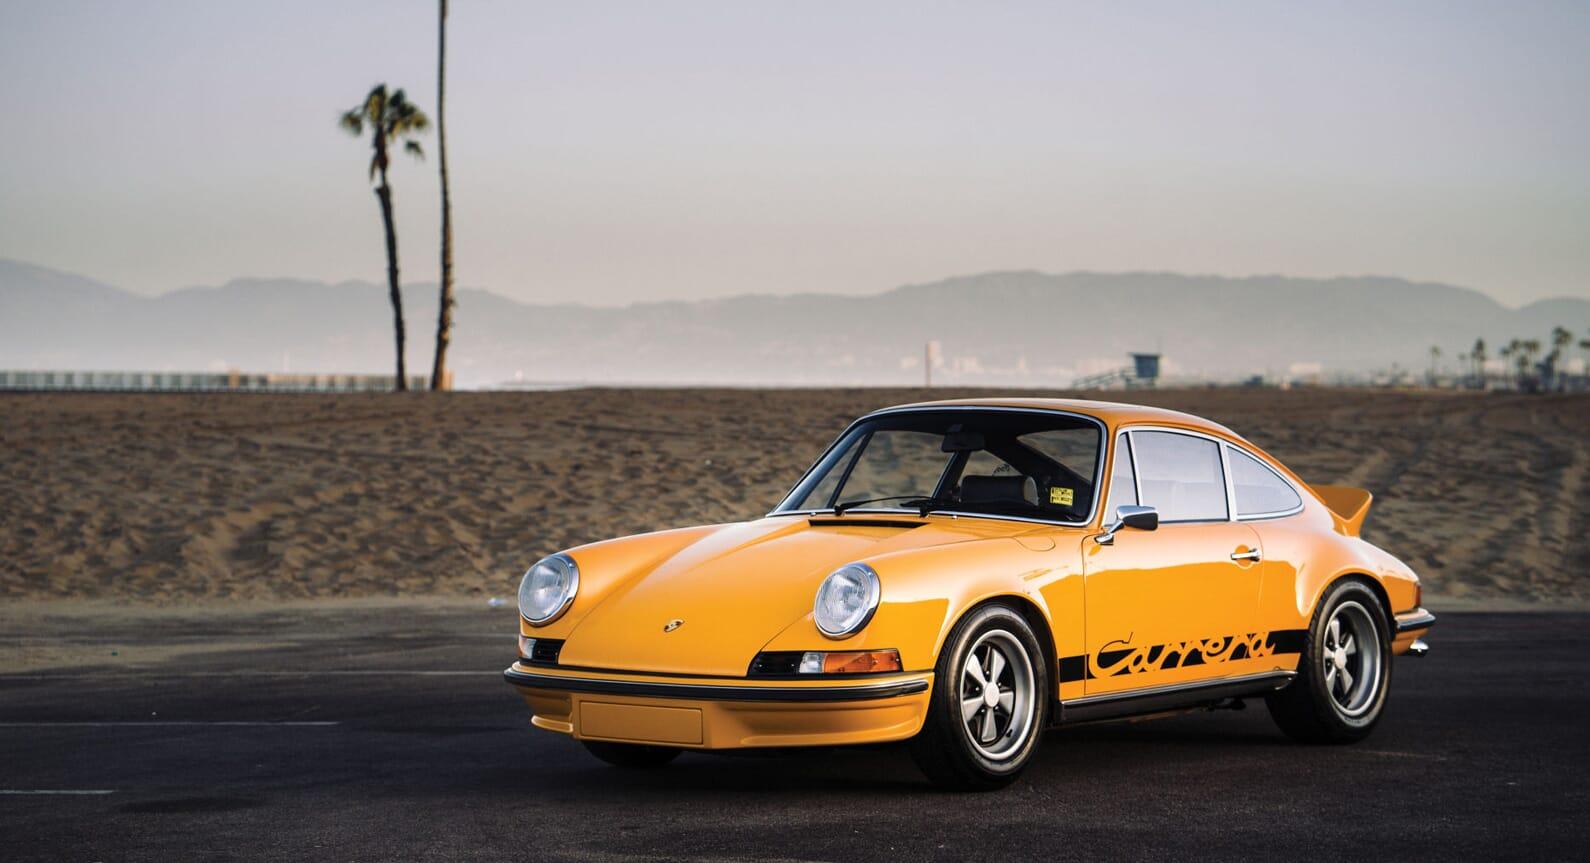 Classic Car Find of the Week: 1973 Porsche 911 Carrera RS